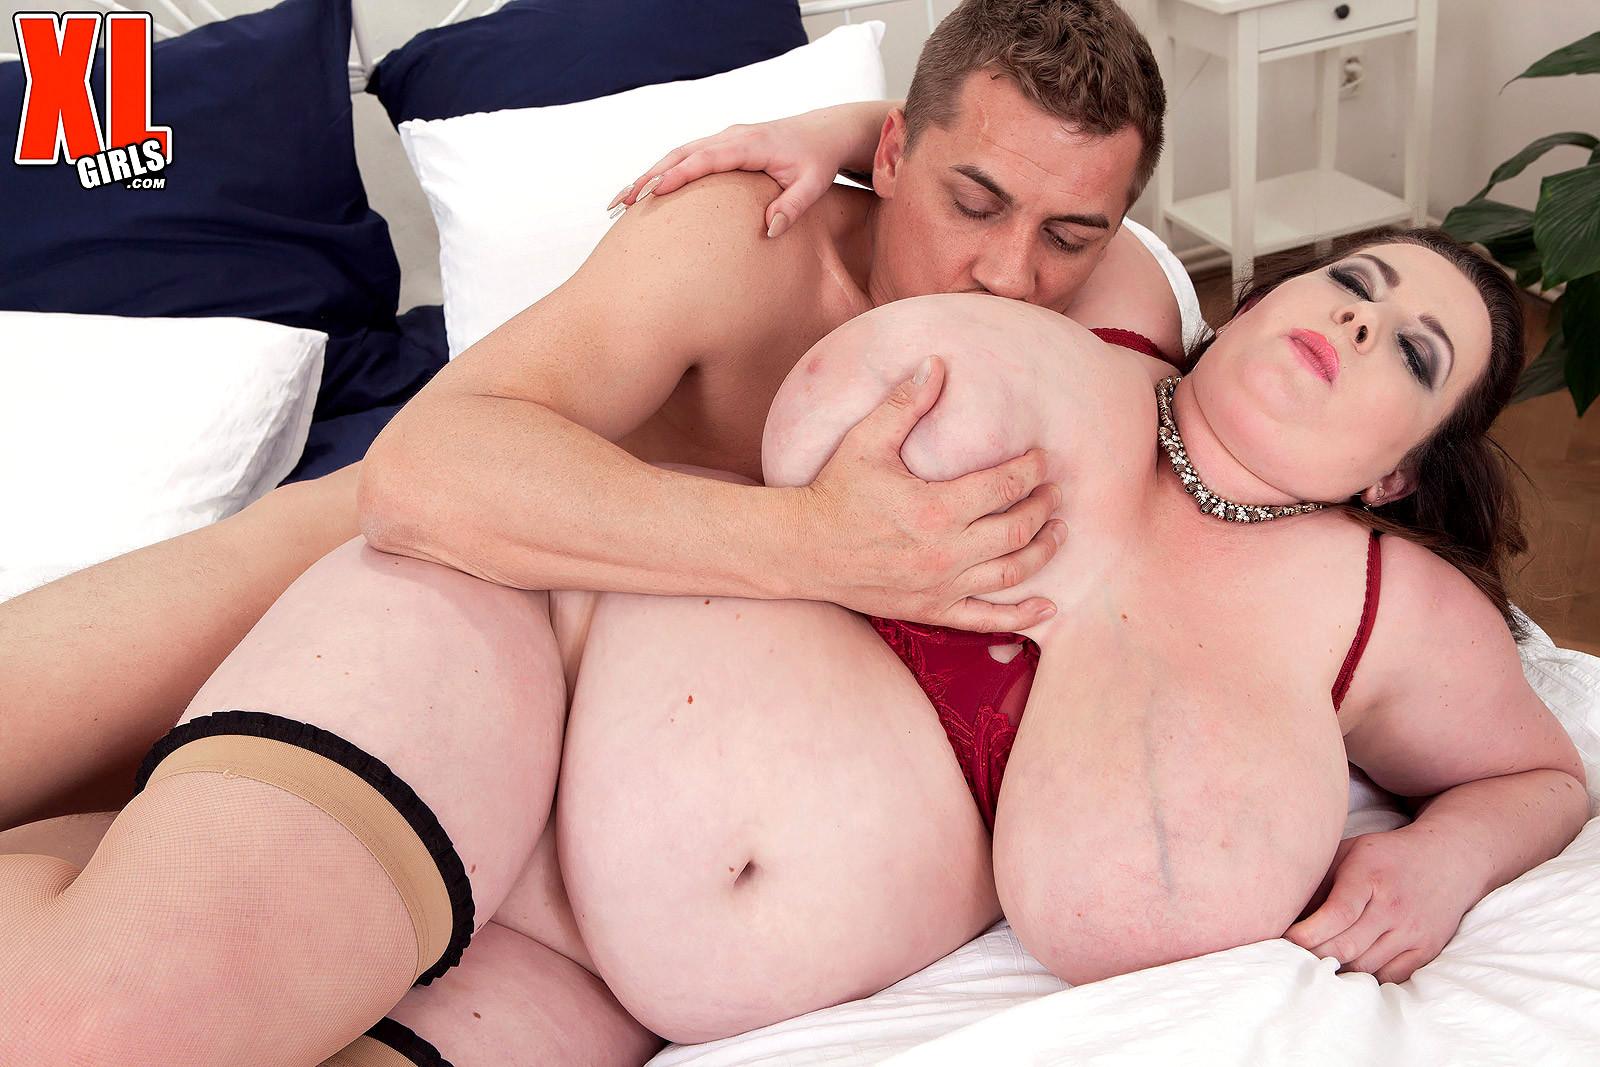 Xl girls porn pics-4255